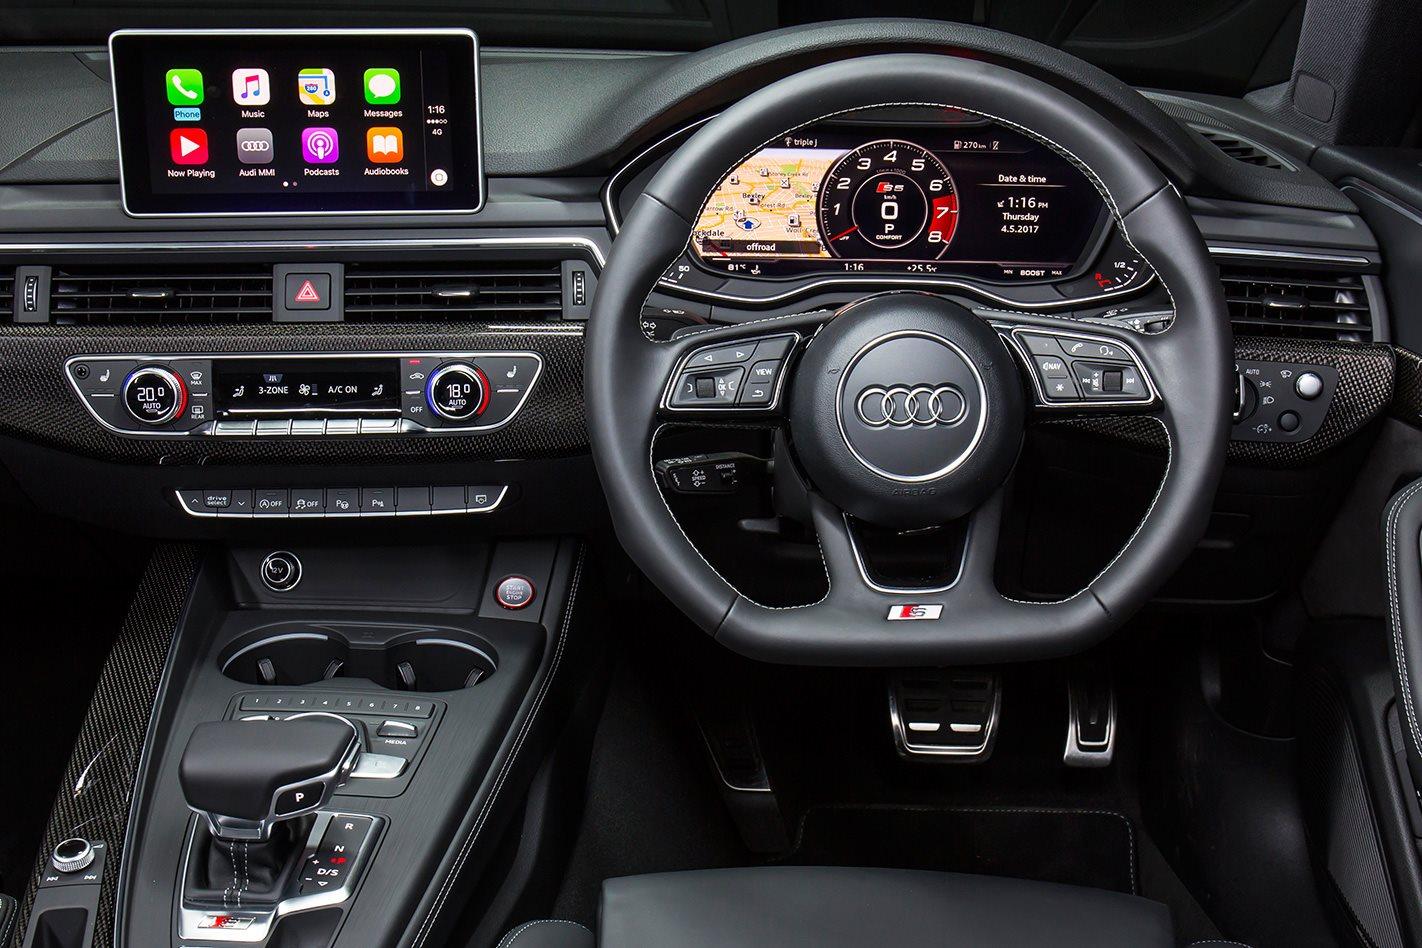 Audi-interior-electronics.jpg